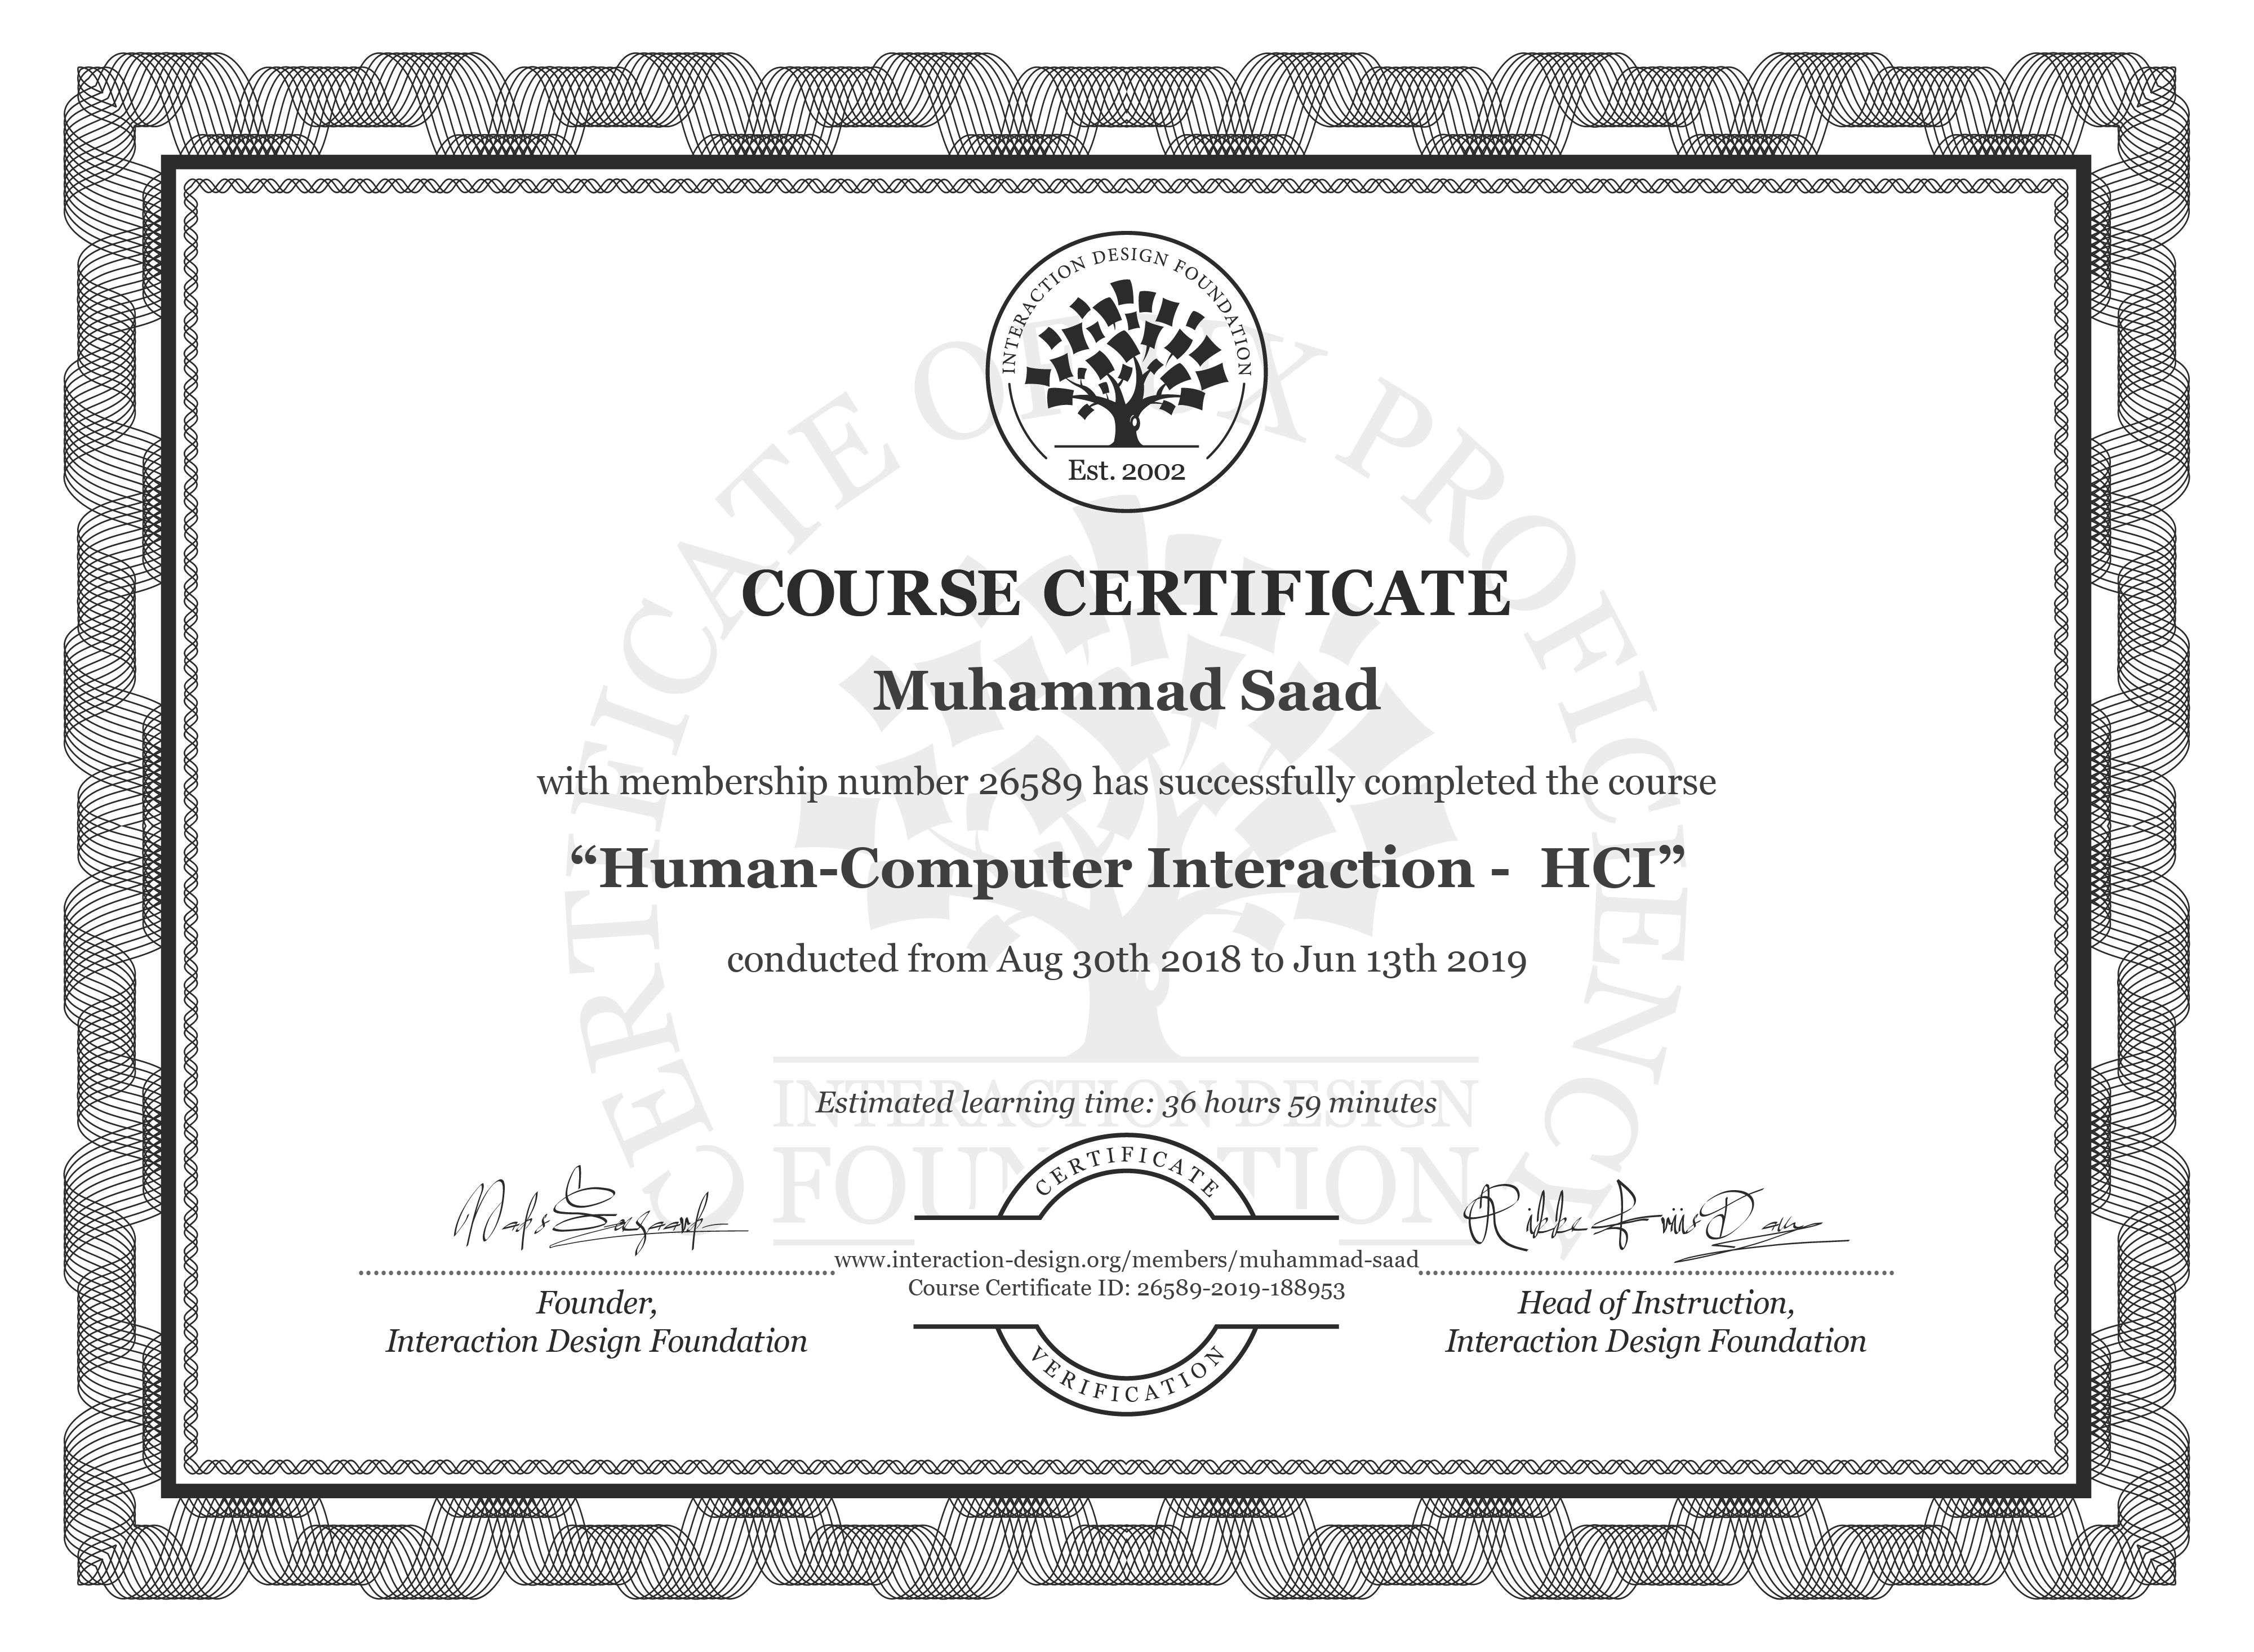 Muhammad Saad: Course Certificate - Human-Computer Interaction -  HCI